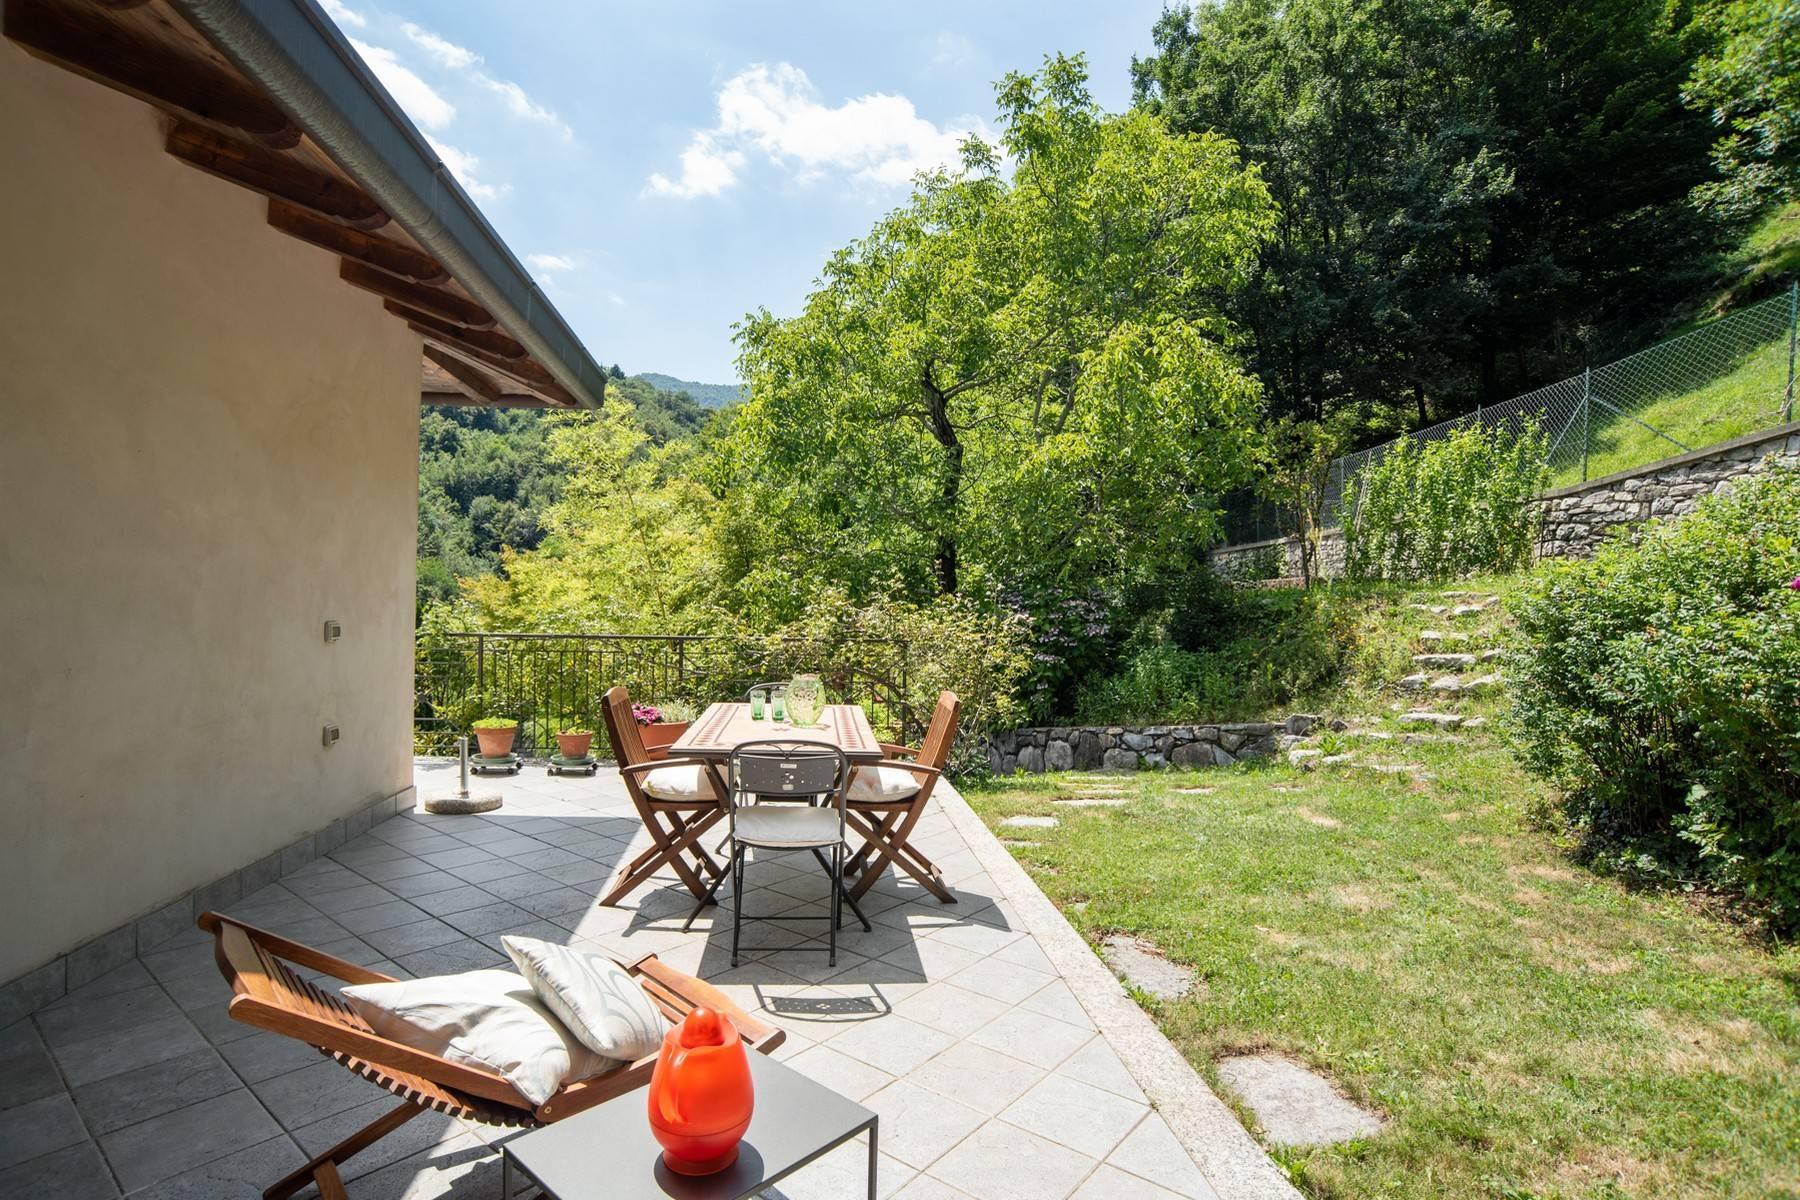 Splendida villa moderna sulla collina soleggiata sopra Argegno - 28